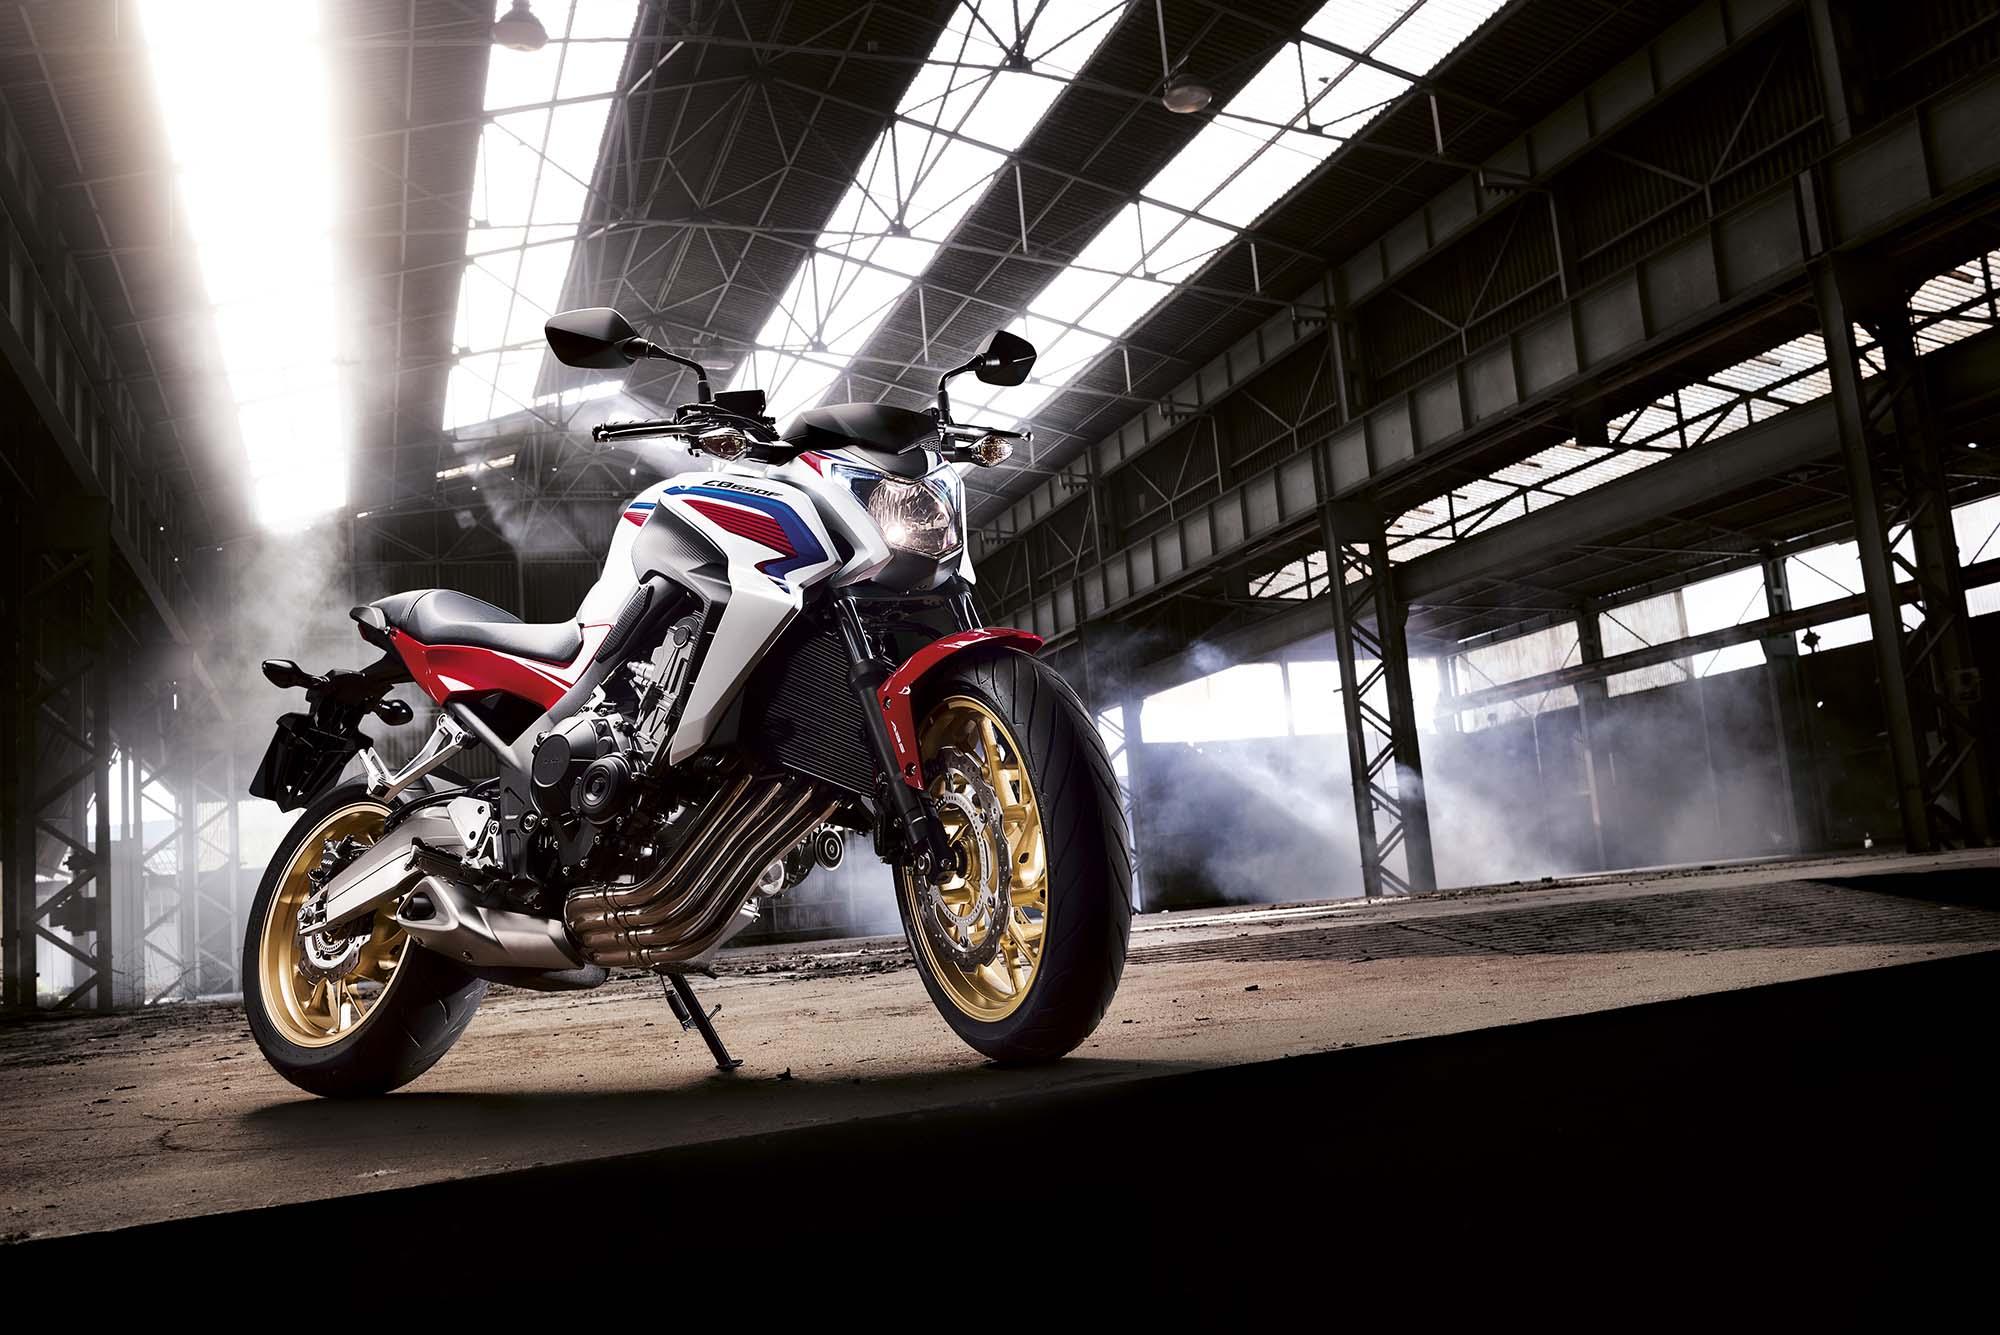 Honda ra xe 800cc cạnh tranh với Kawasaki, Yamaha